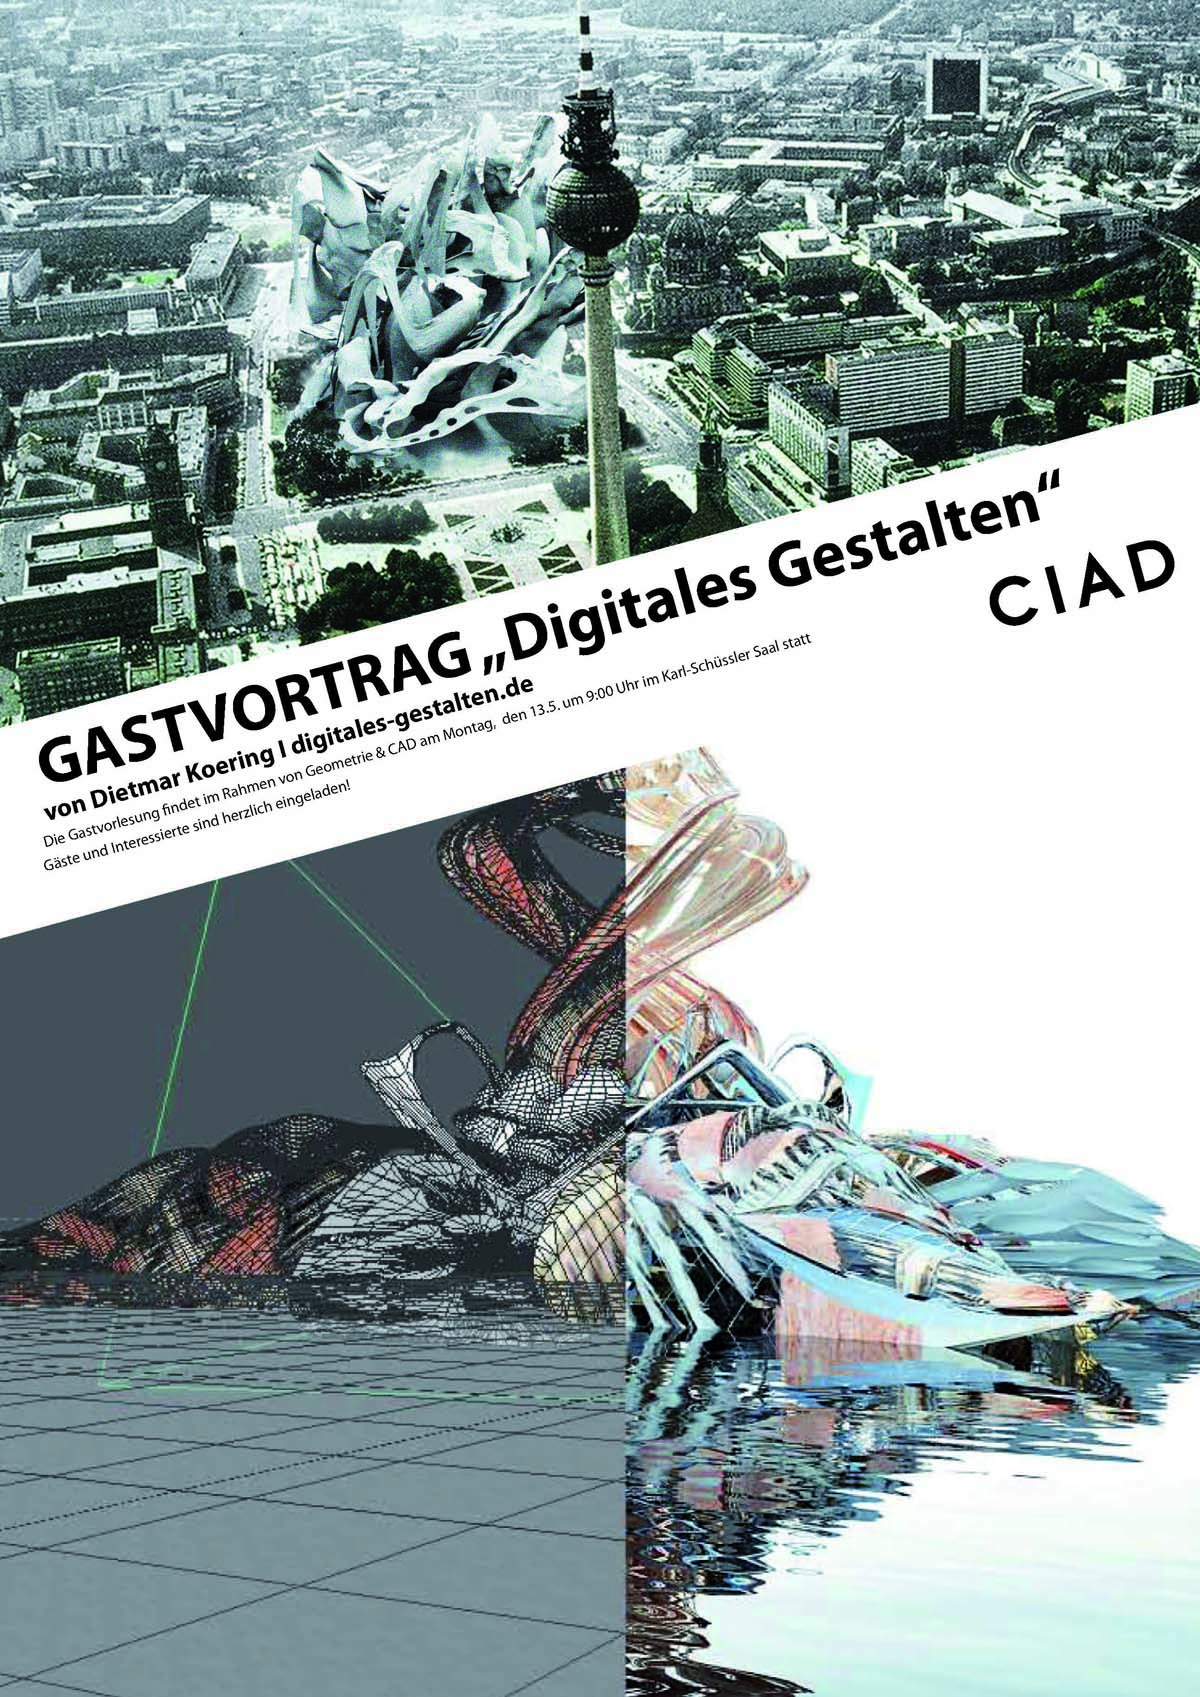 Gastvortrag Digitales Gestalten C-I-A-D